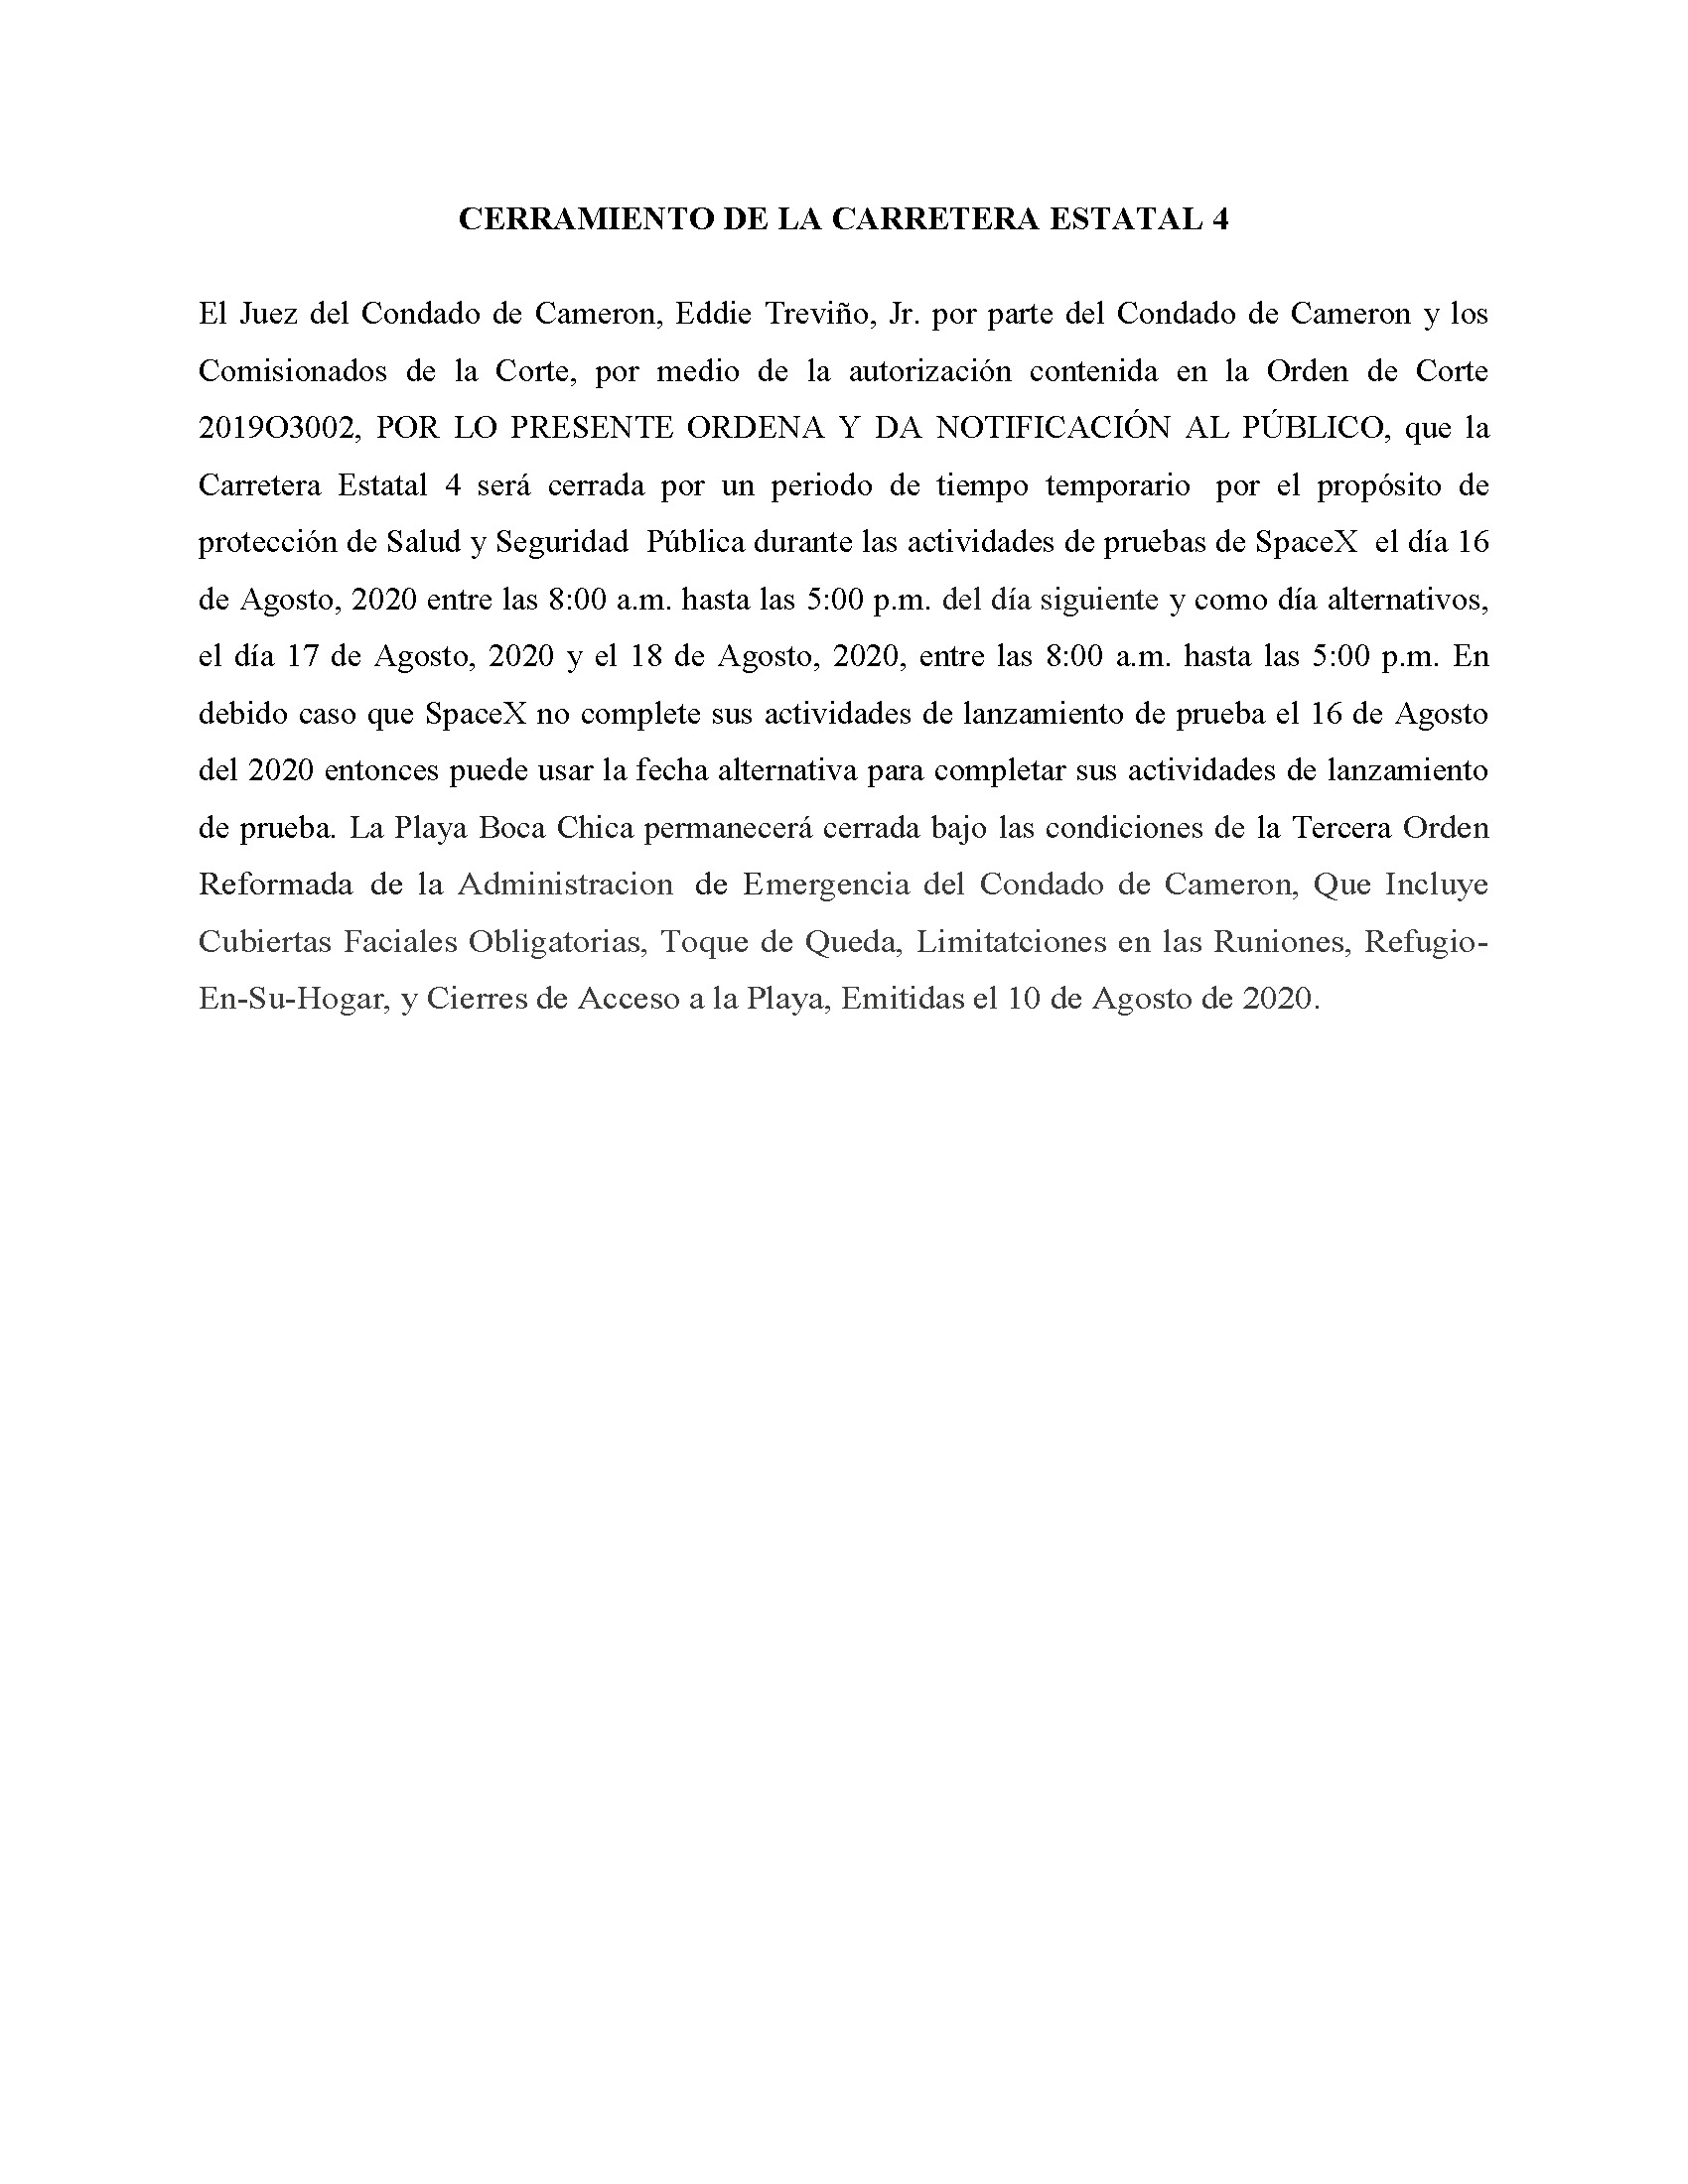 ORDER.CLOSURE OF HIGHWAY 4.SPANISH.08.16.20